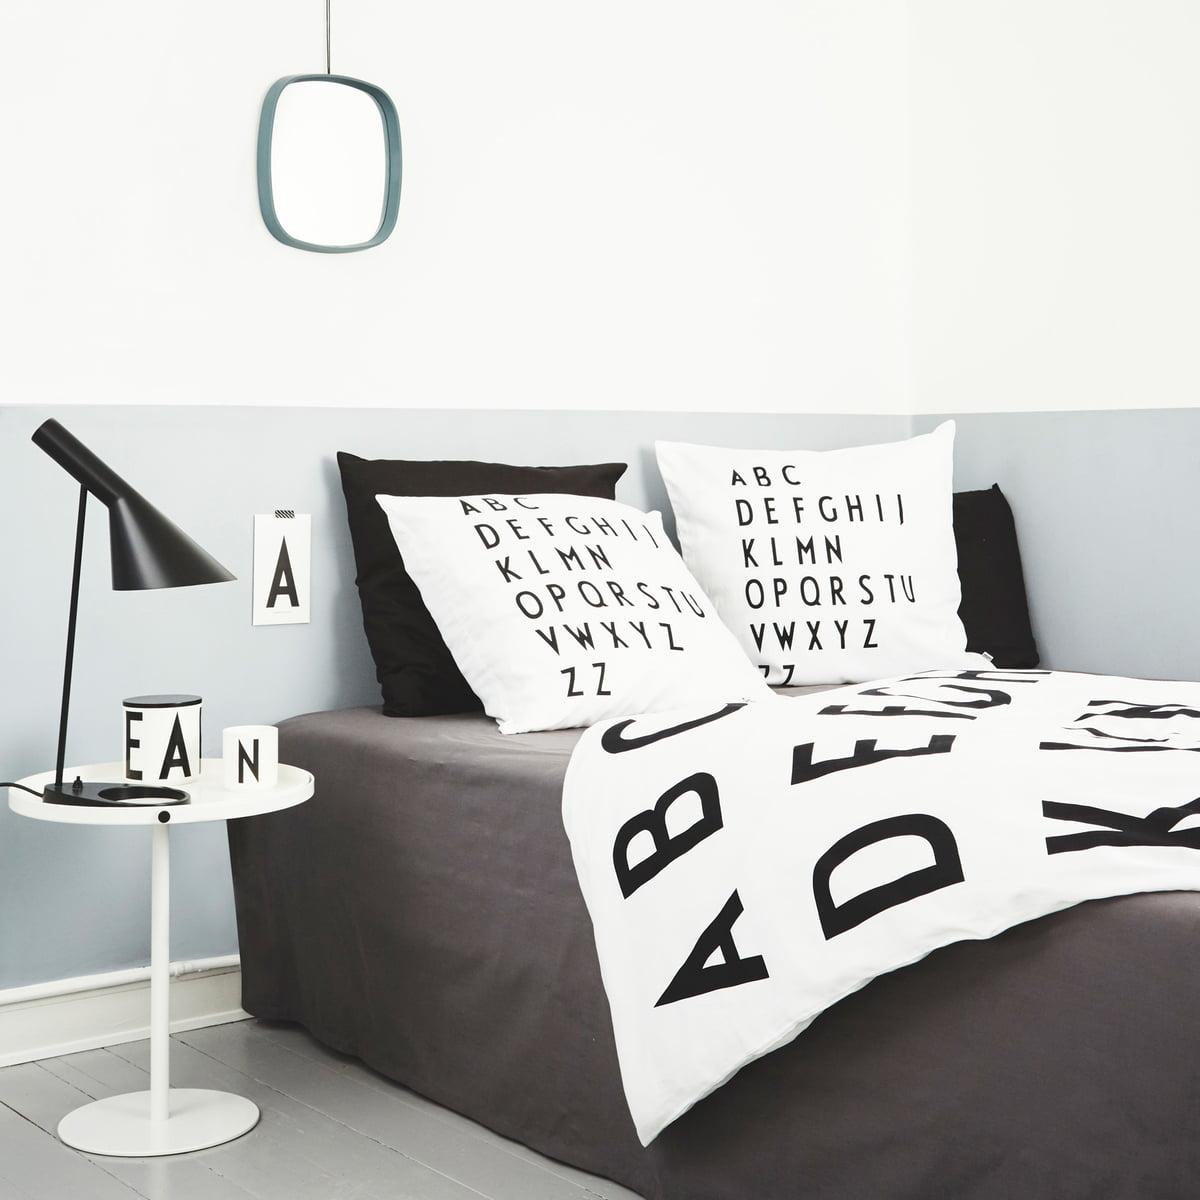 d40318f4b7e Design Letters – ABC sengetøj, 140 x 200 cm (DK)